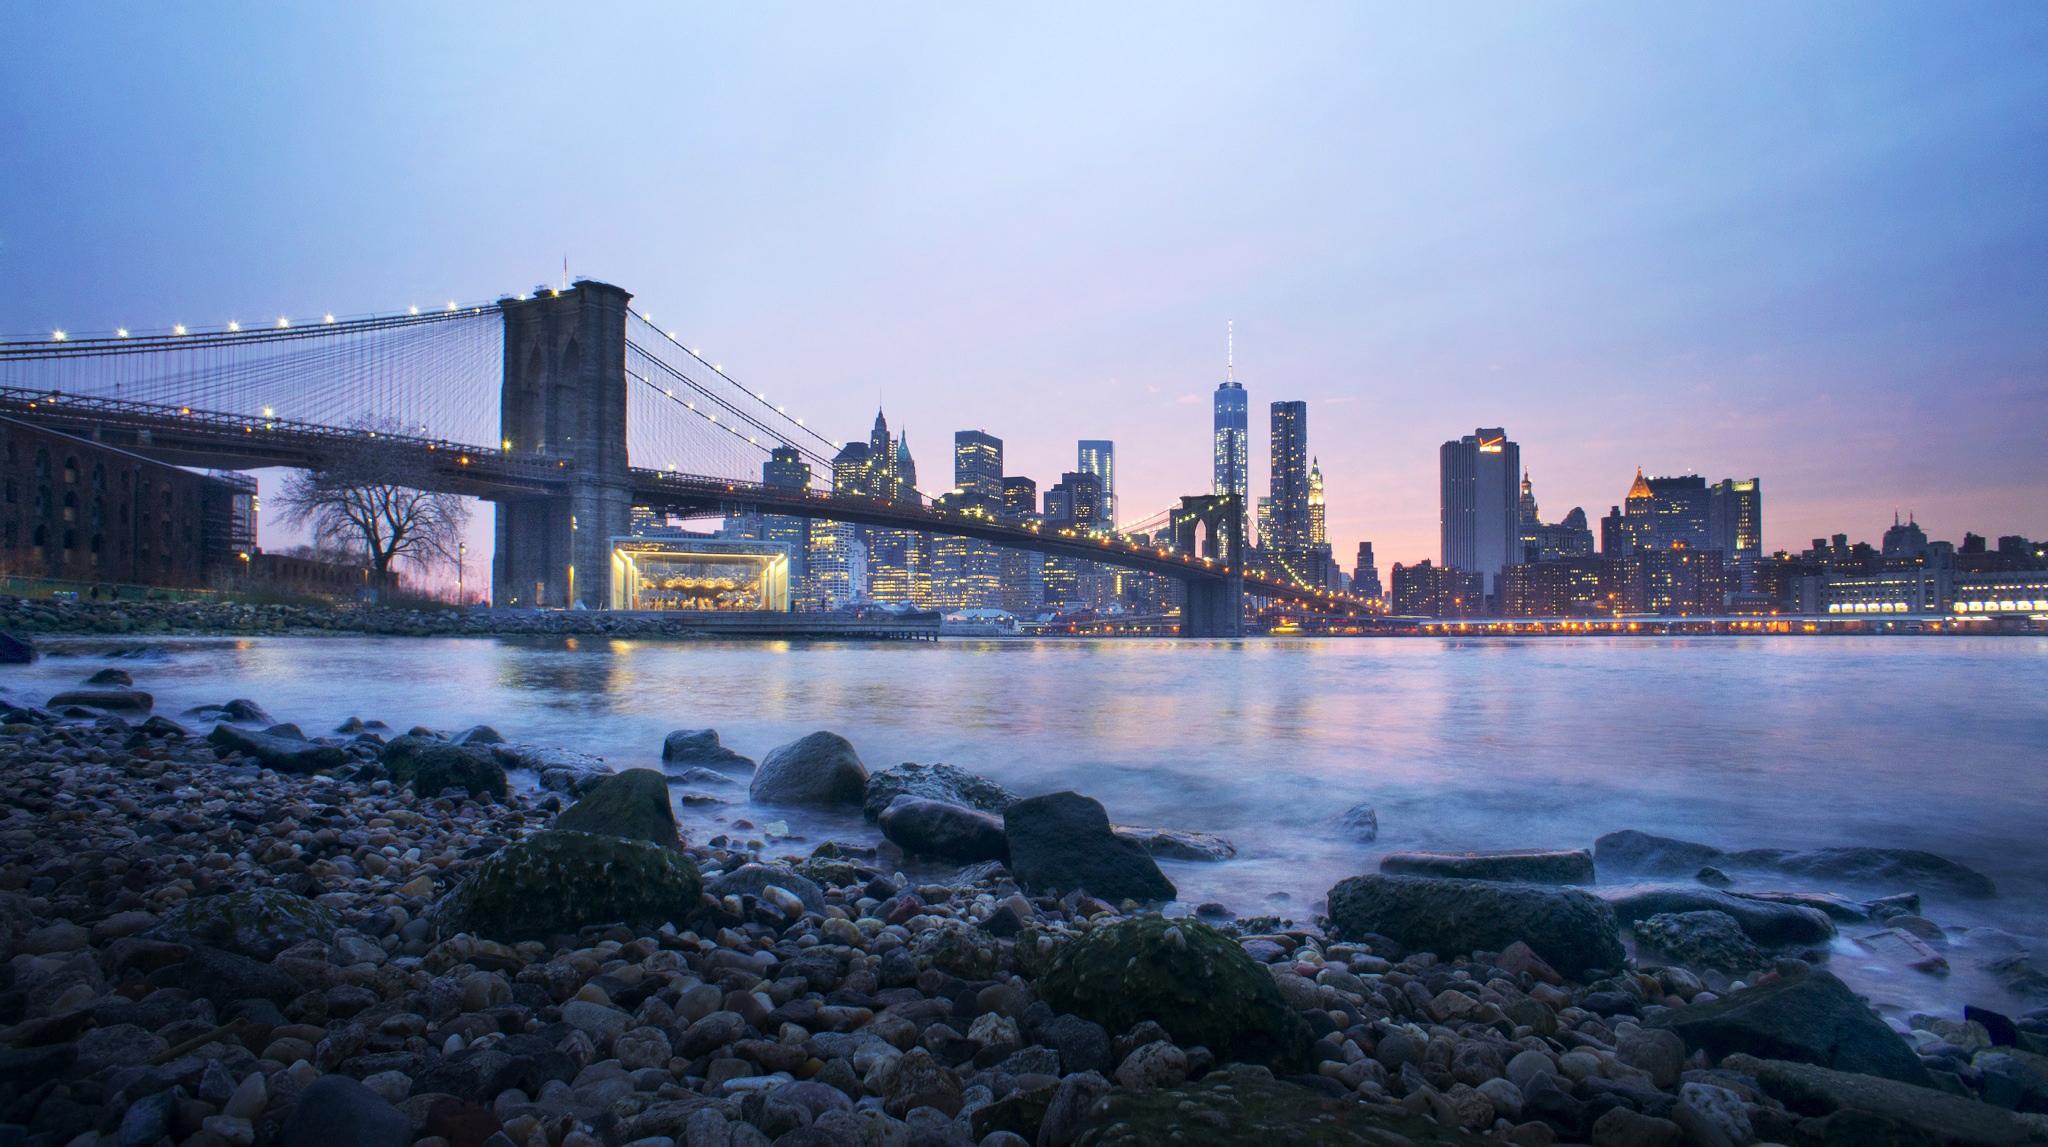 wetter in new york im mai temperatur klimatabelle. Black Bedroom Furniture Sets. Home Design Ideas